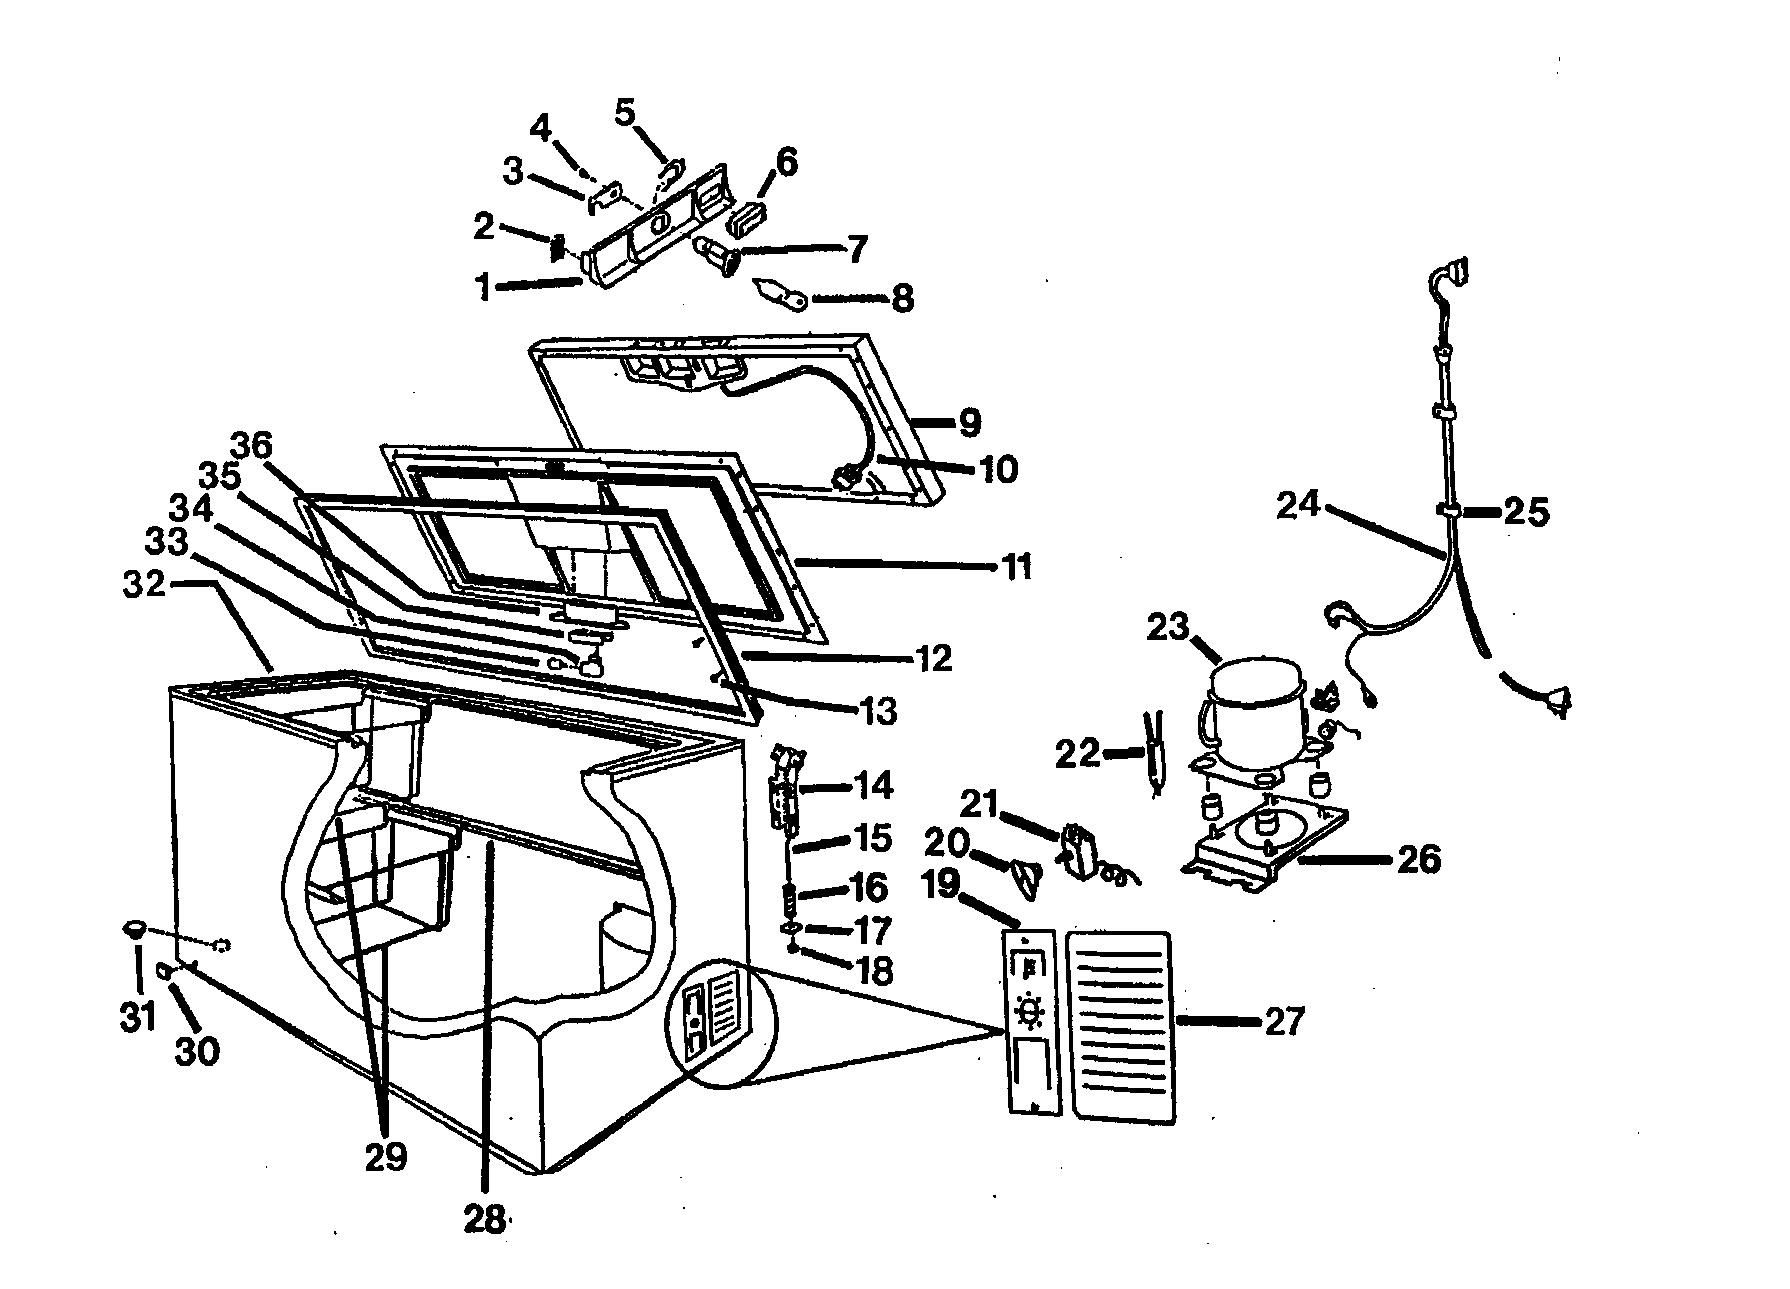 Wc-Wood model LCH0701PW chest freezer genuine parts